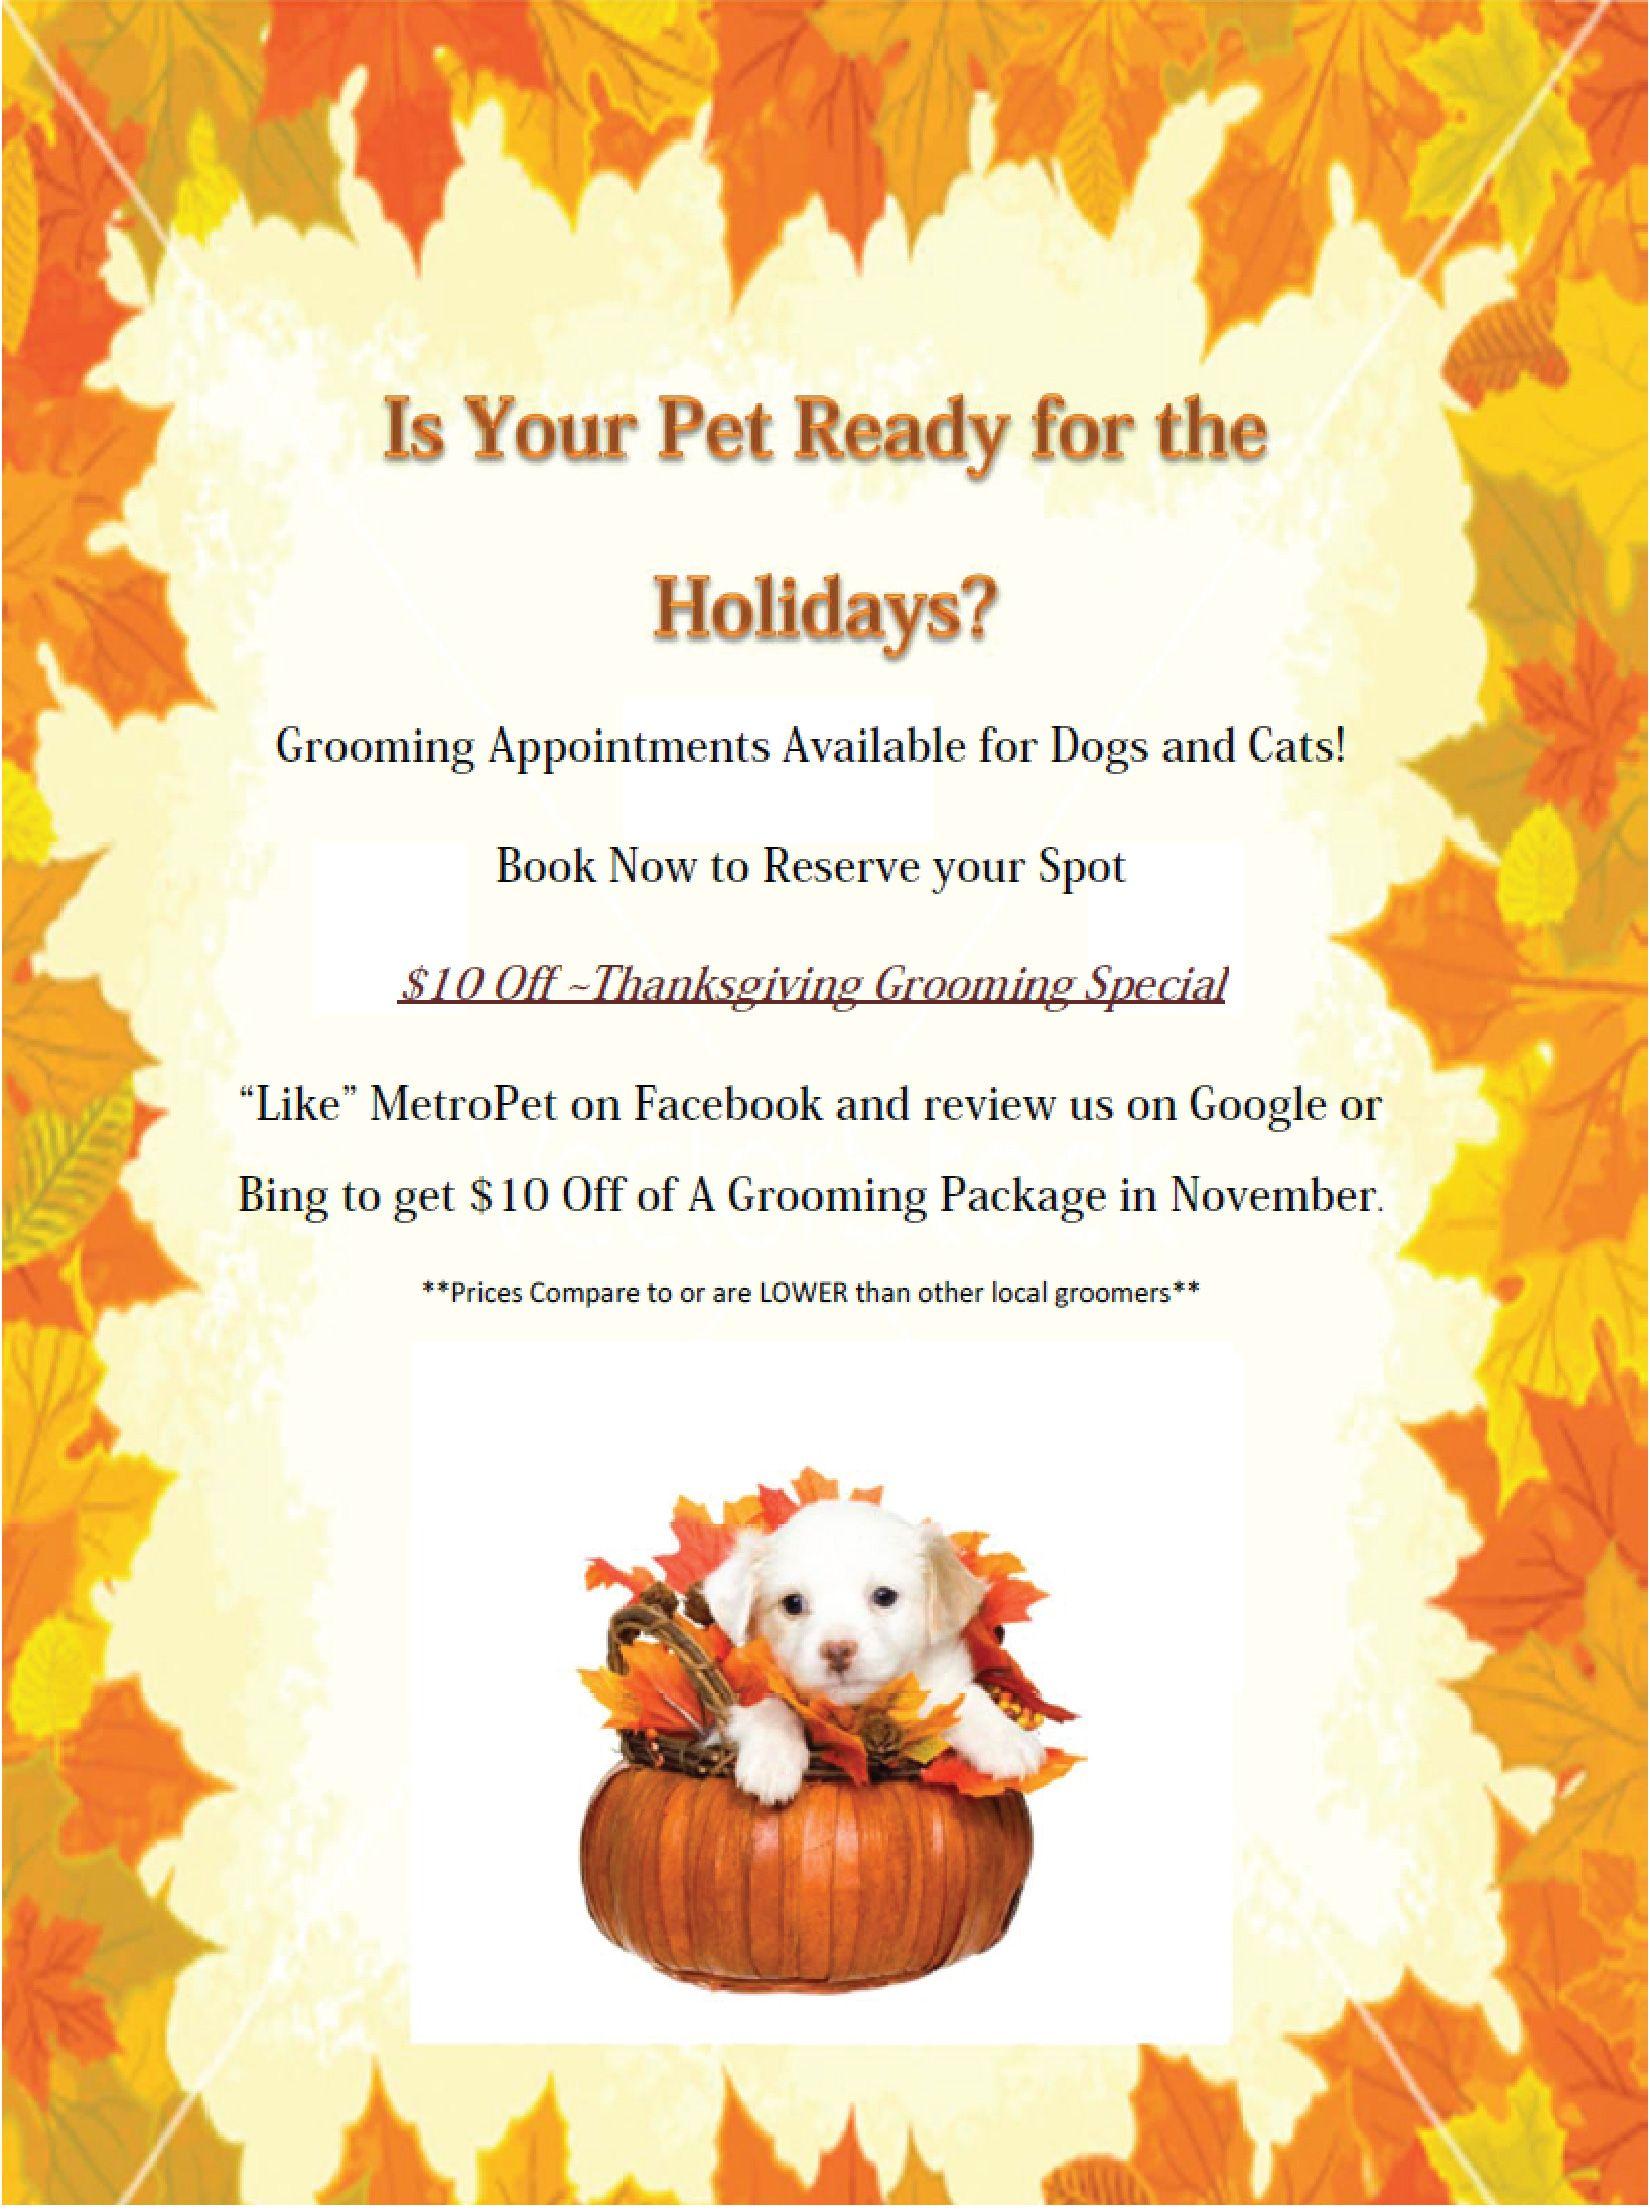 MetroPet Veterinary Clinic Thanksgiving Grooming Specials